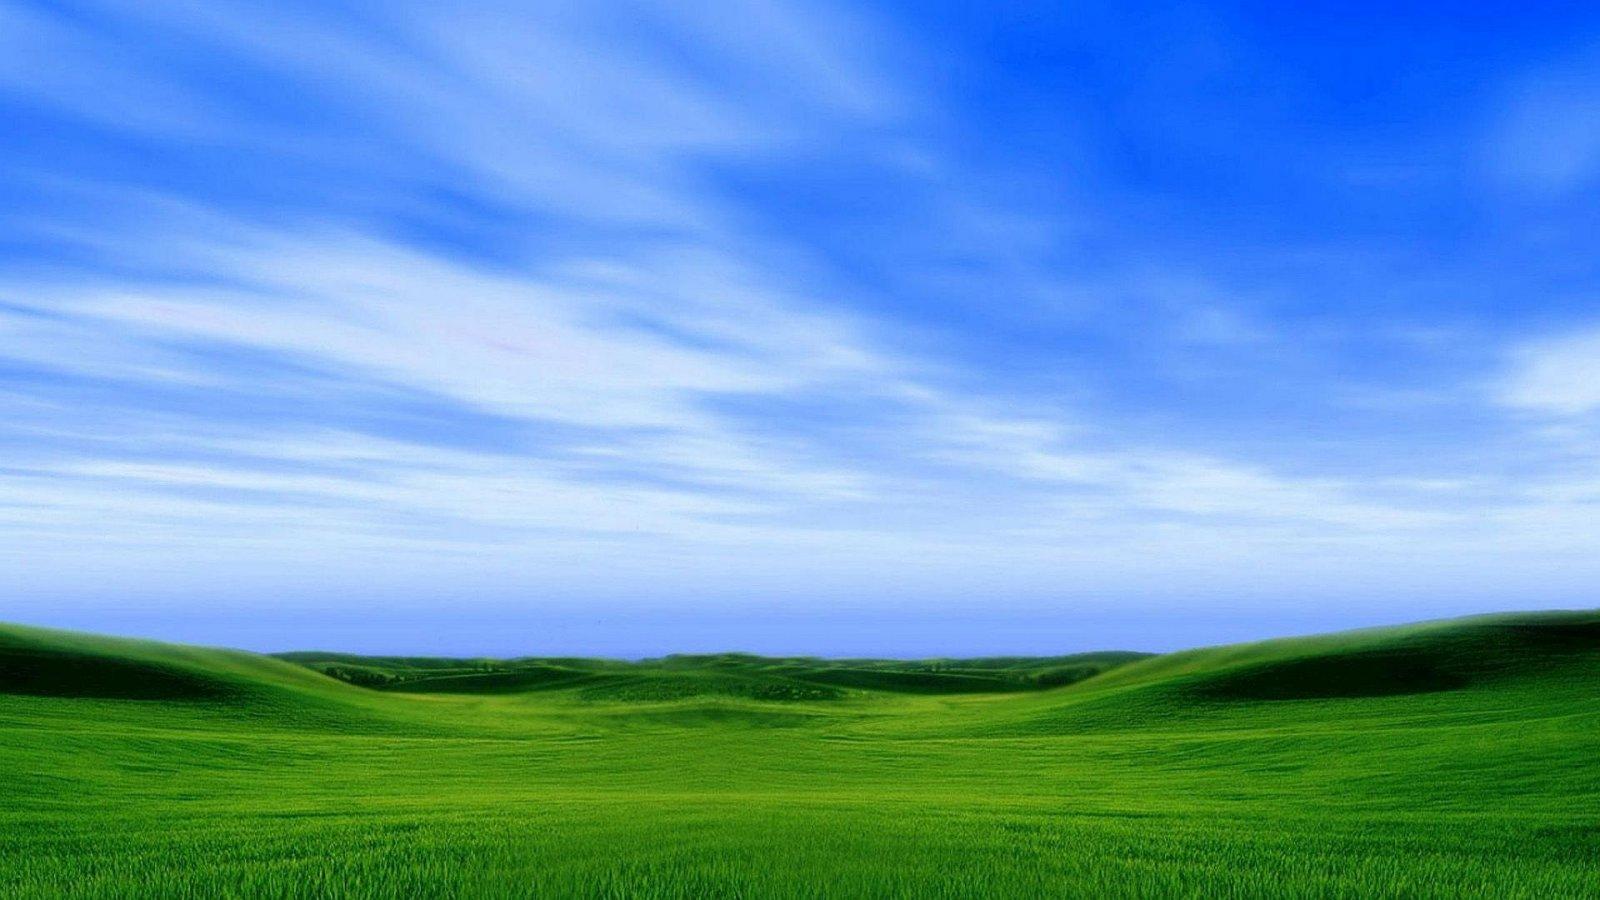 Windows XP Bliss Wallpaper (1920 X 1080).jpg